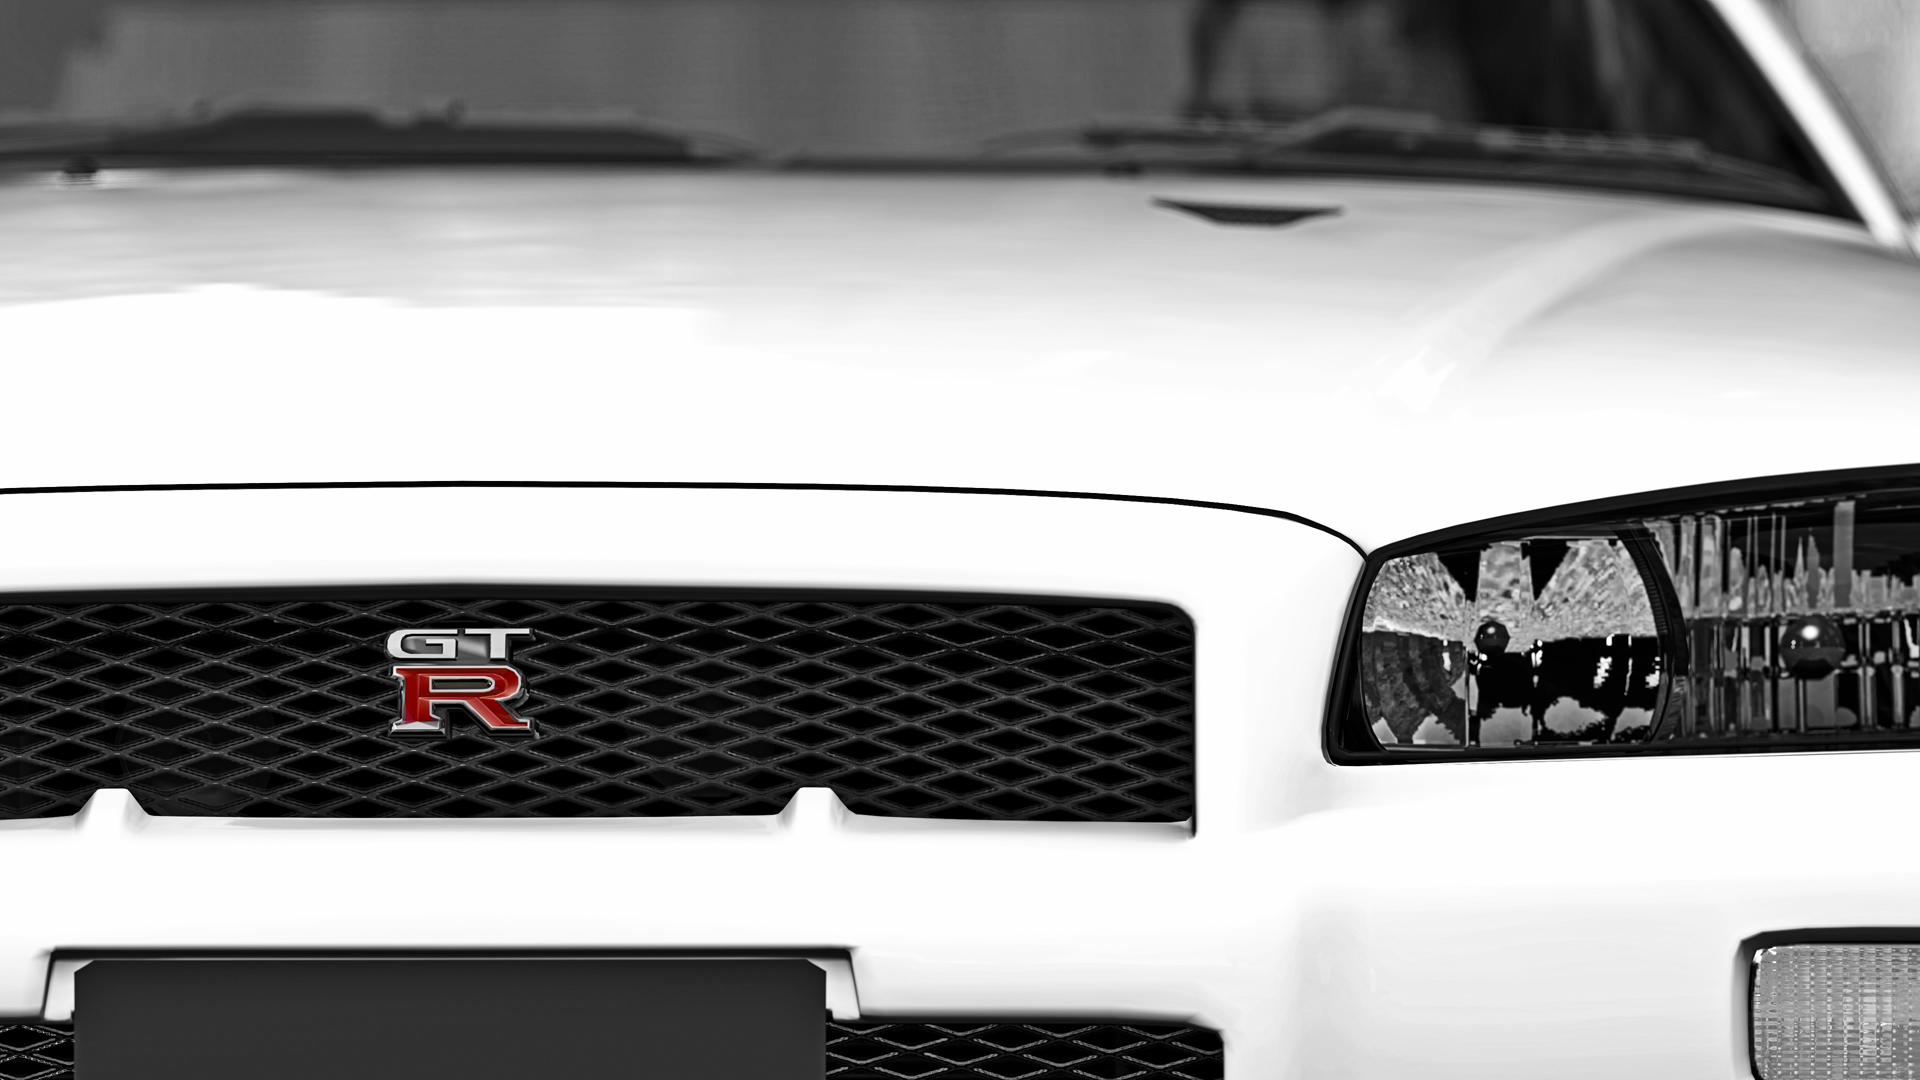 GTR Badge   1080p Wallpaper by EmptySoulR35 1920x1080